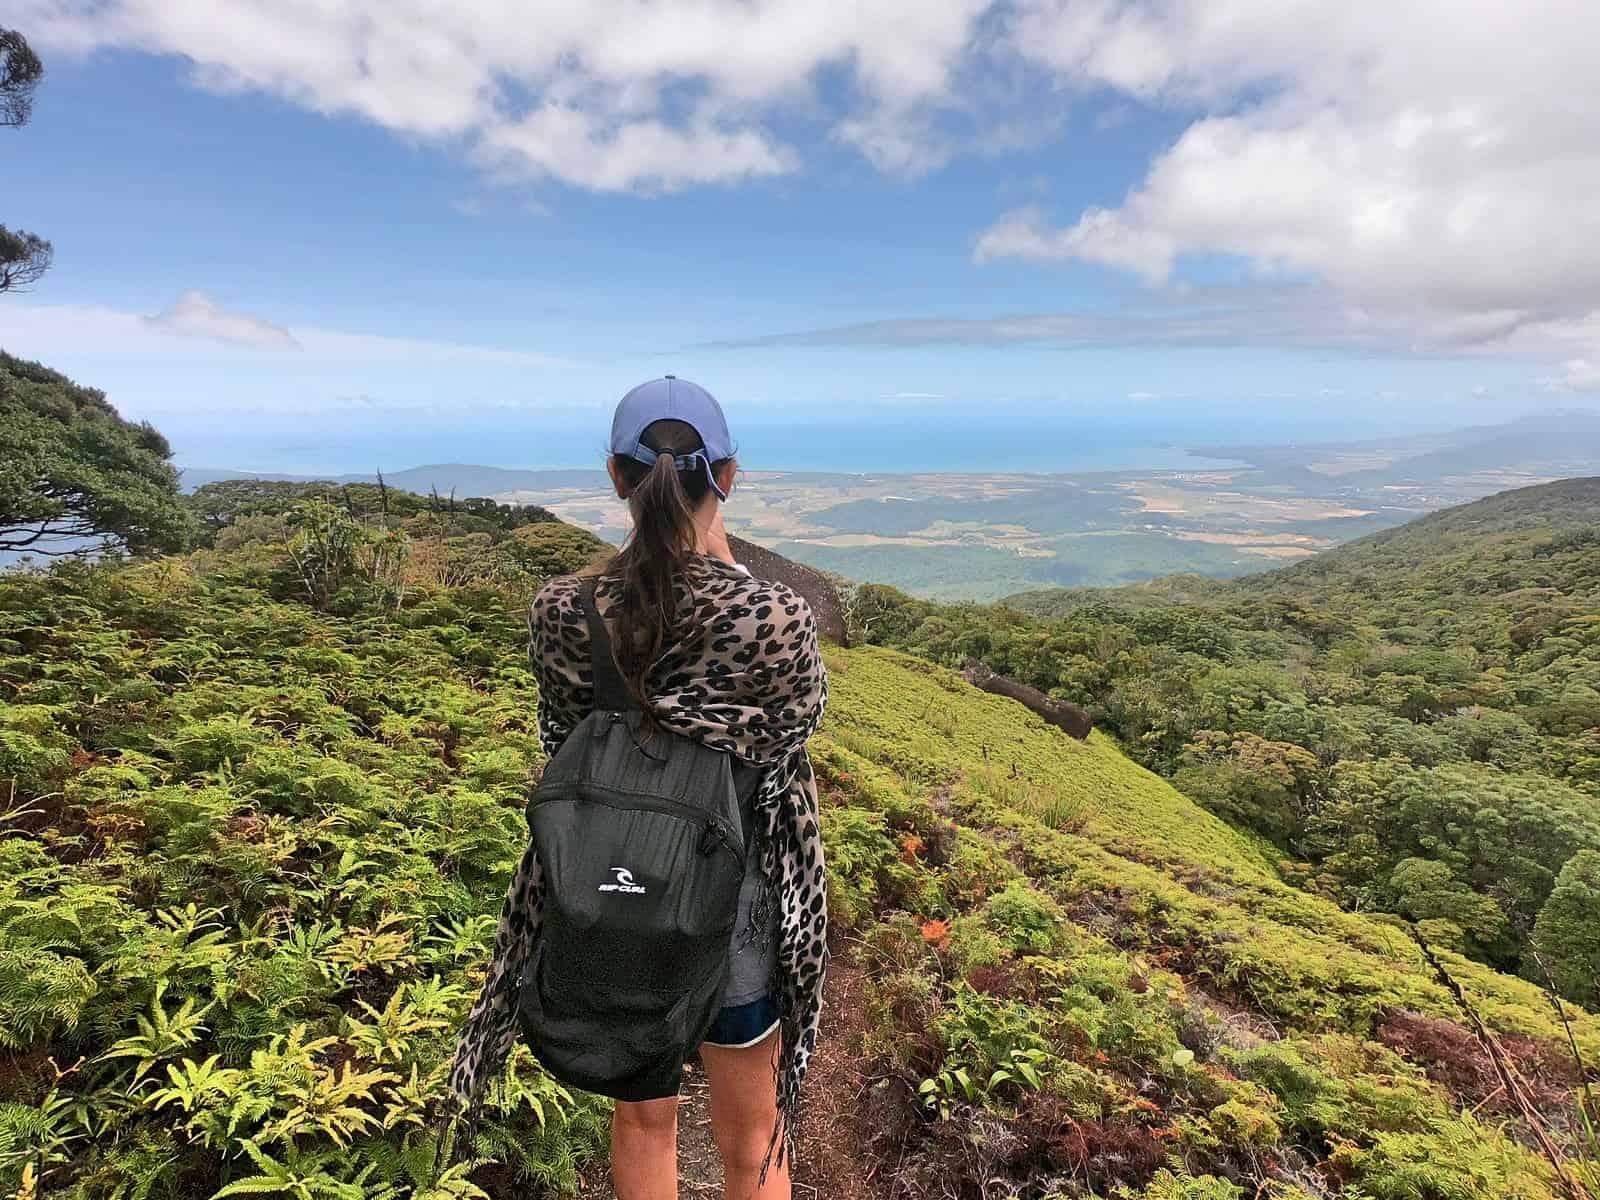 Devils-Thumb-hike-Tropical-North-Queensland-Mossman-Port-Douglas-Travel-Mermaid